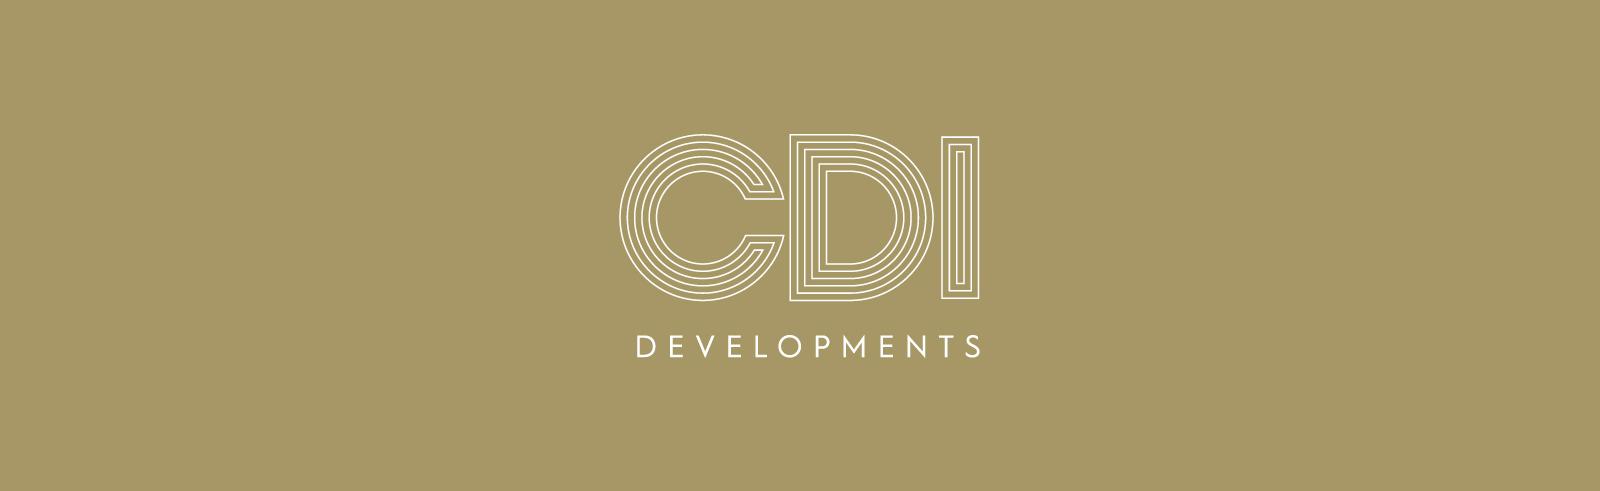 Corinthia Developments International banner